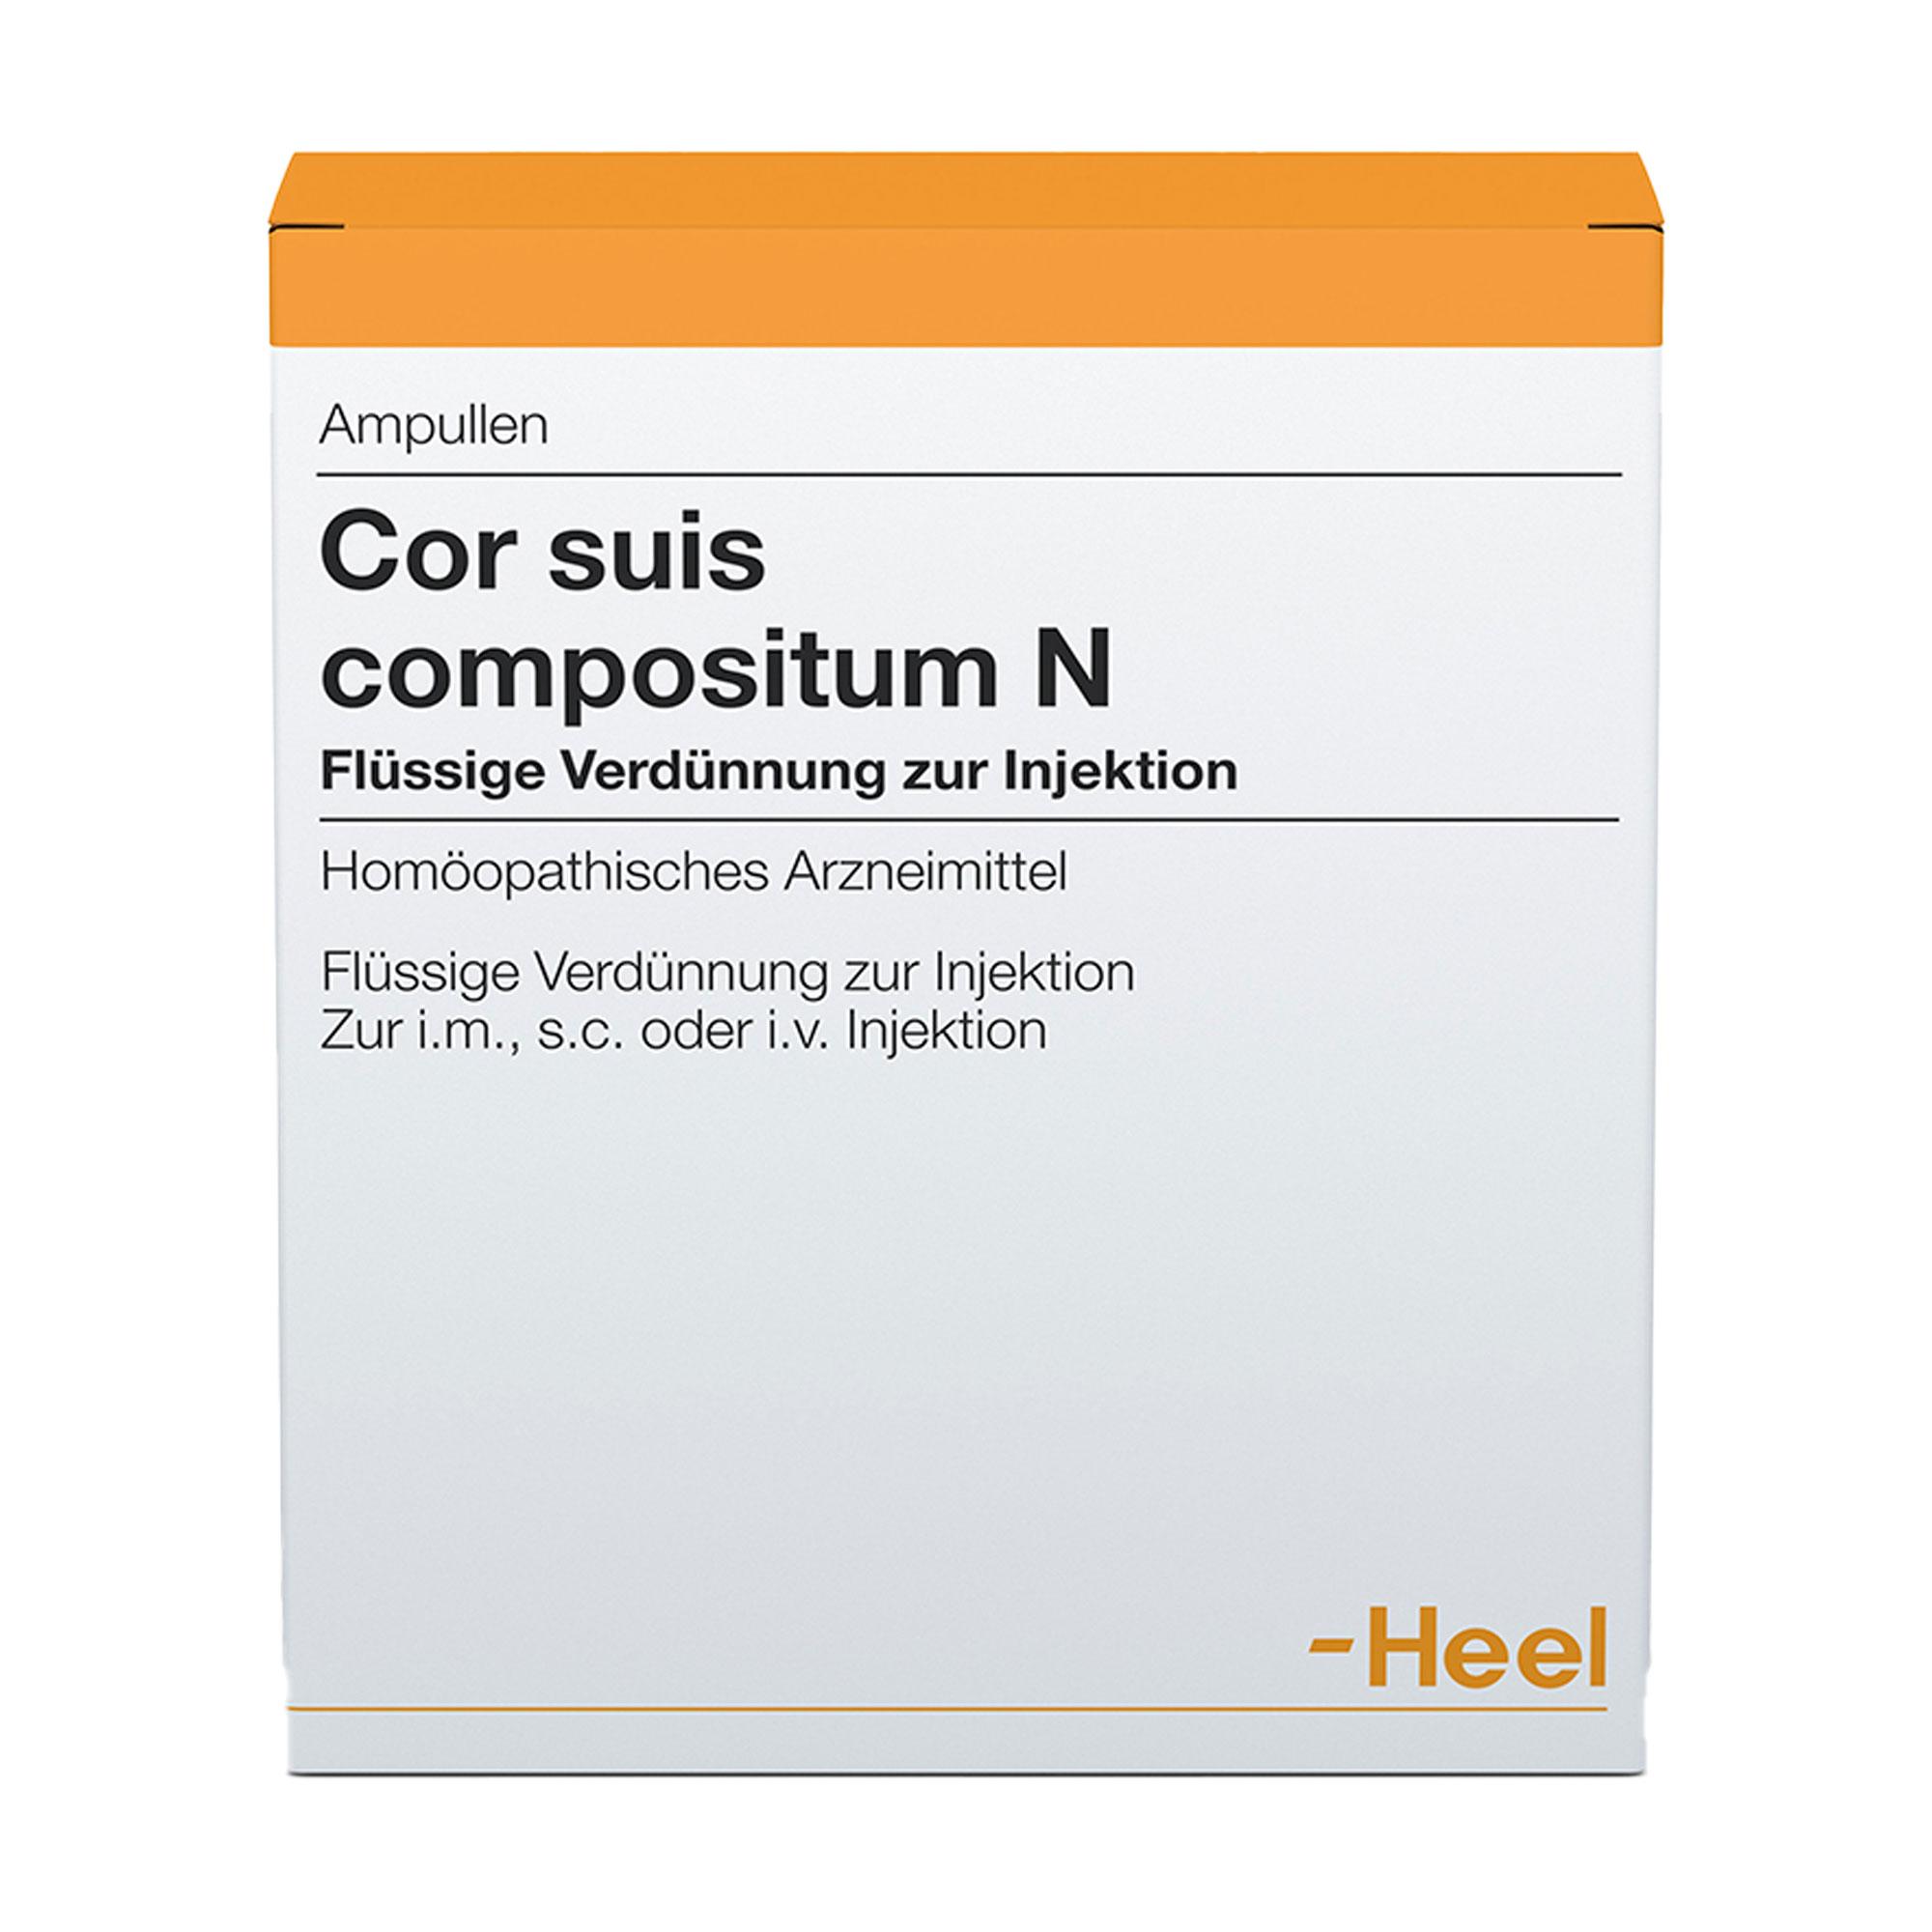 COR SUIS COMPOSITUM N